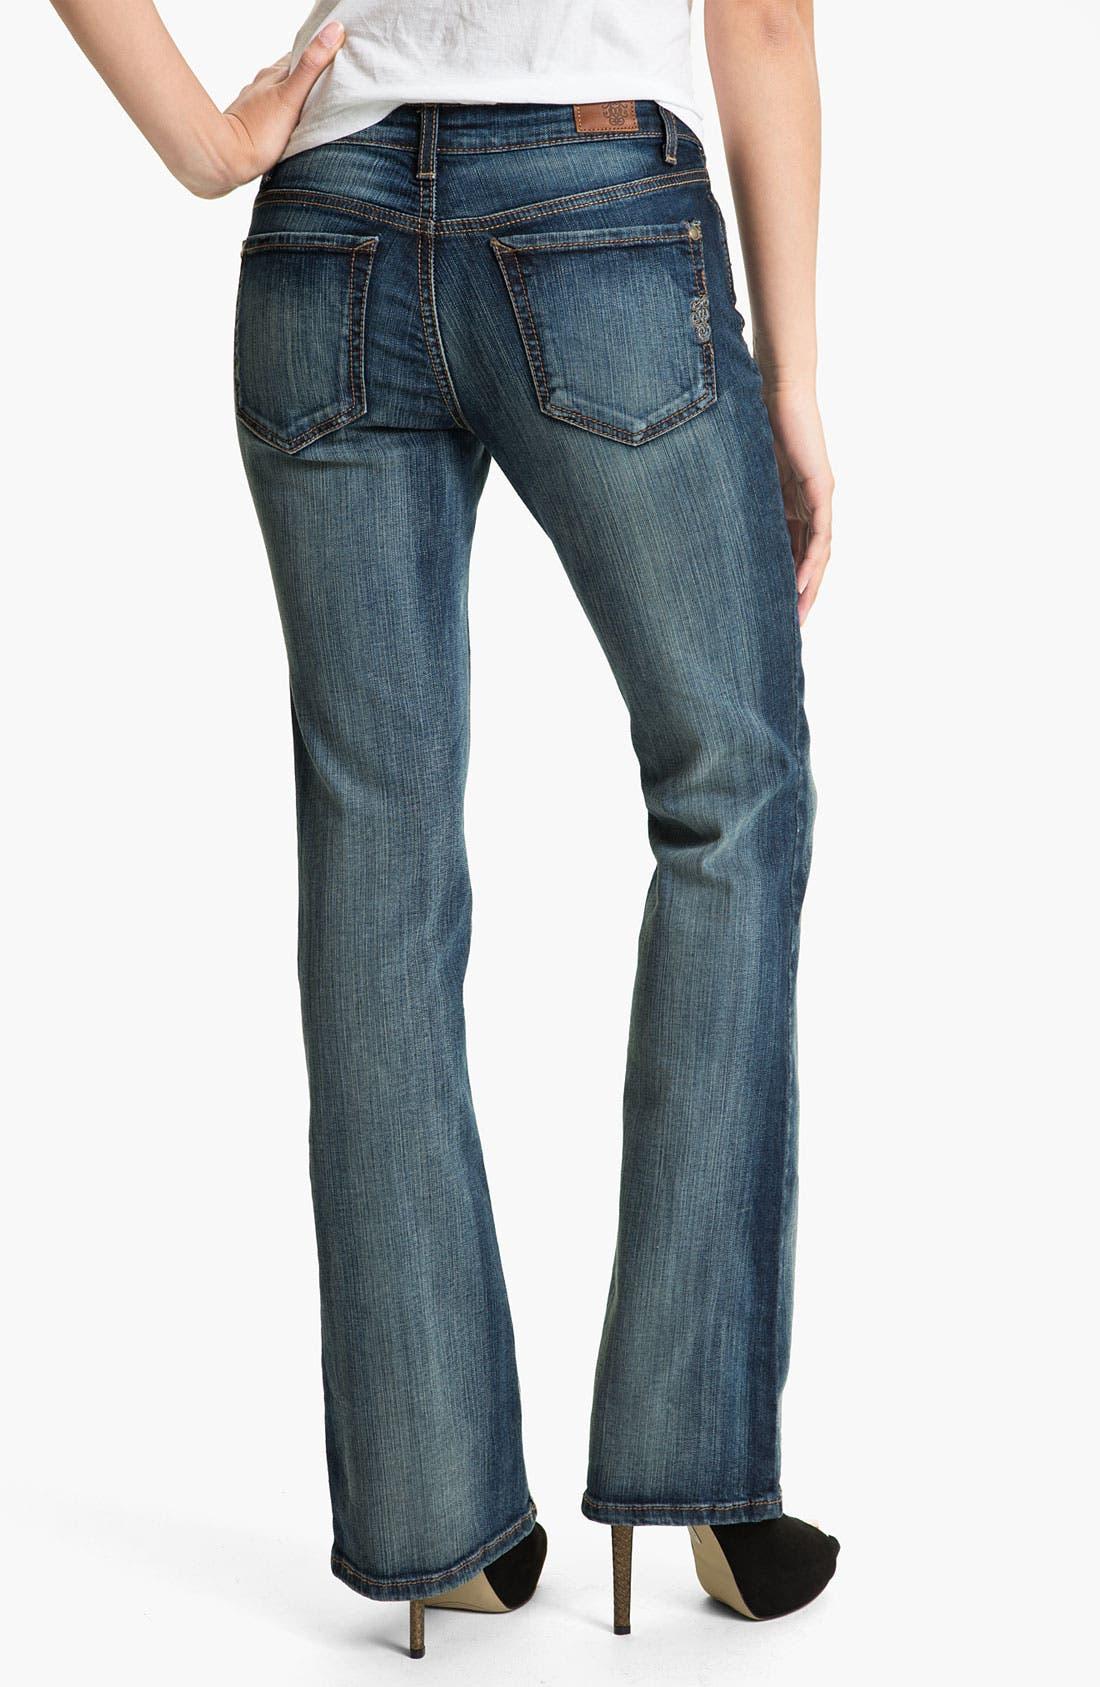 Alternate Image 2  - Jessica Simpson 'Rockin' Curvy Bootcut Jeans (Blitzen) (Online Only)